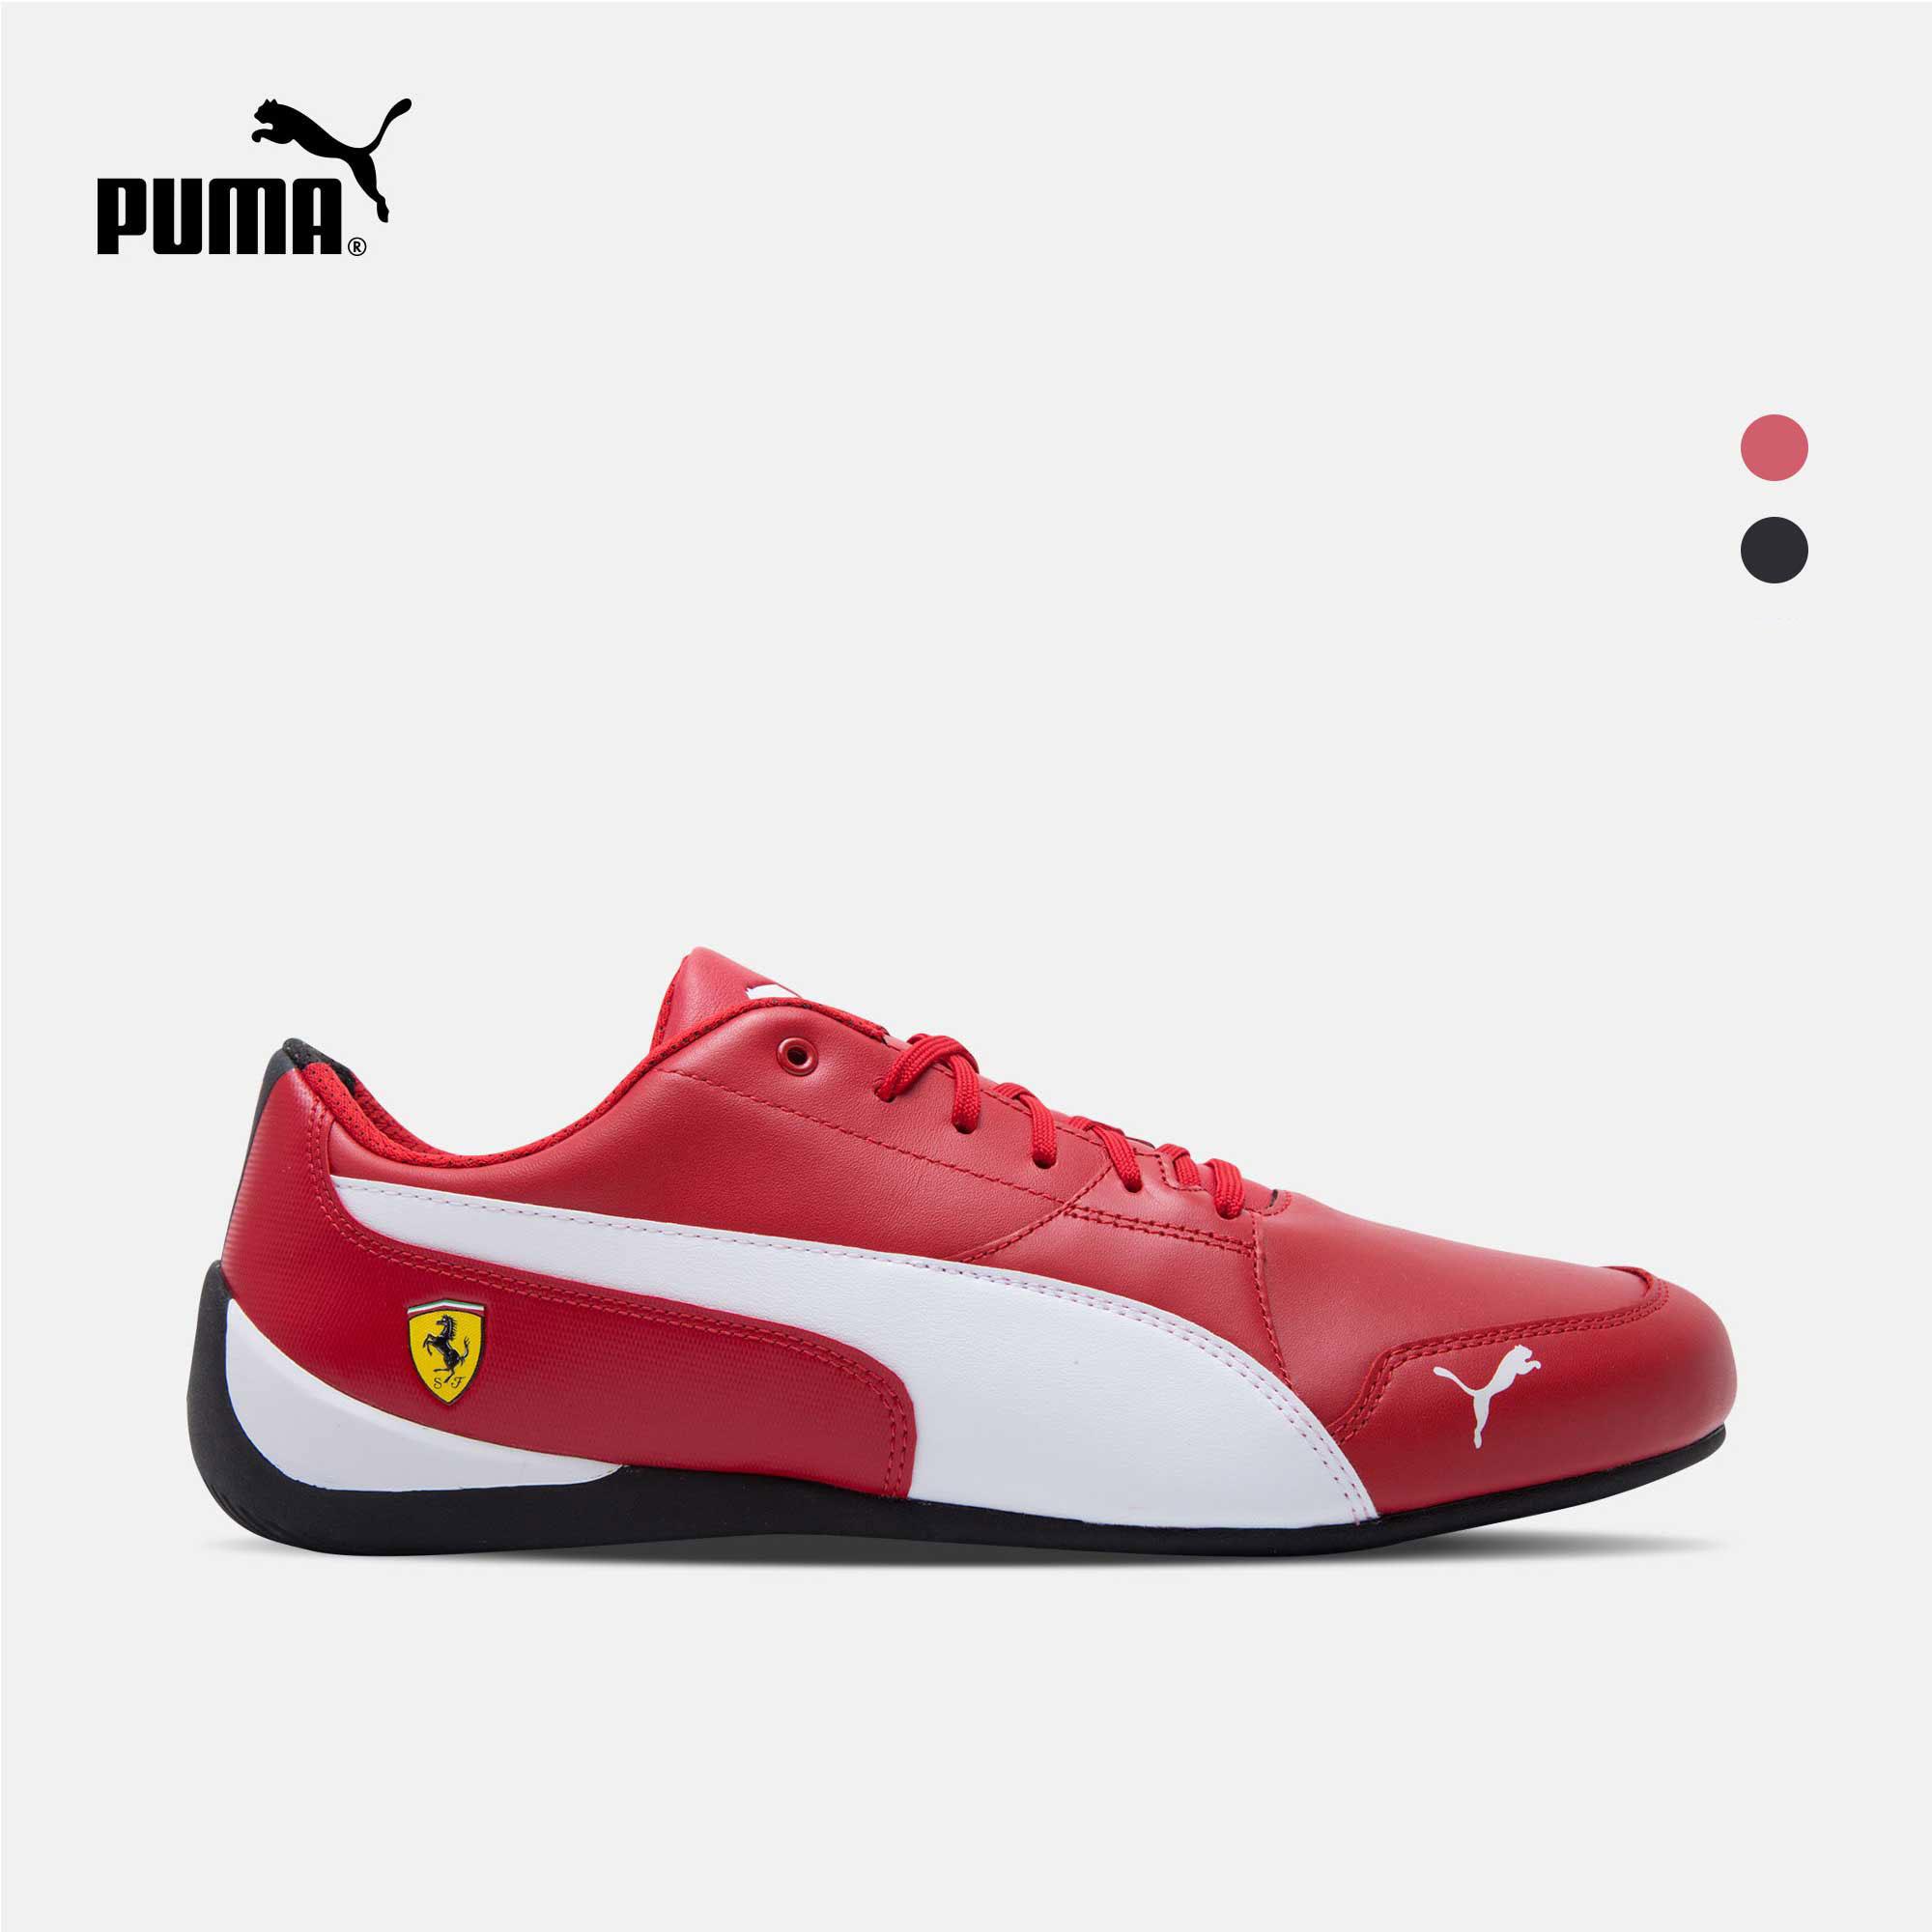 Puma Puma official men s racing shoes Scuderia Ferrari Drift Cat 7 305998 37e88386f